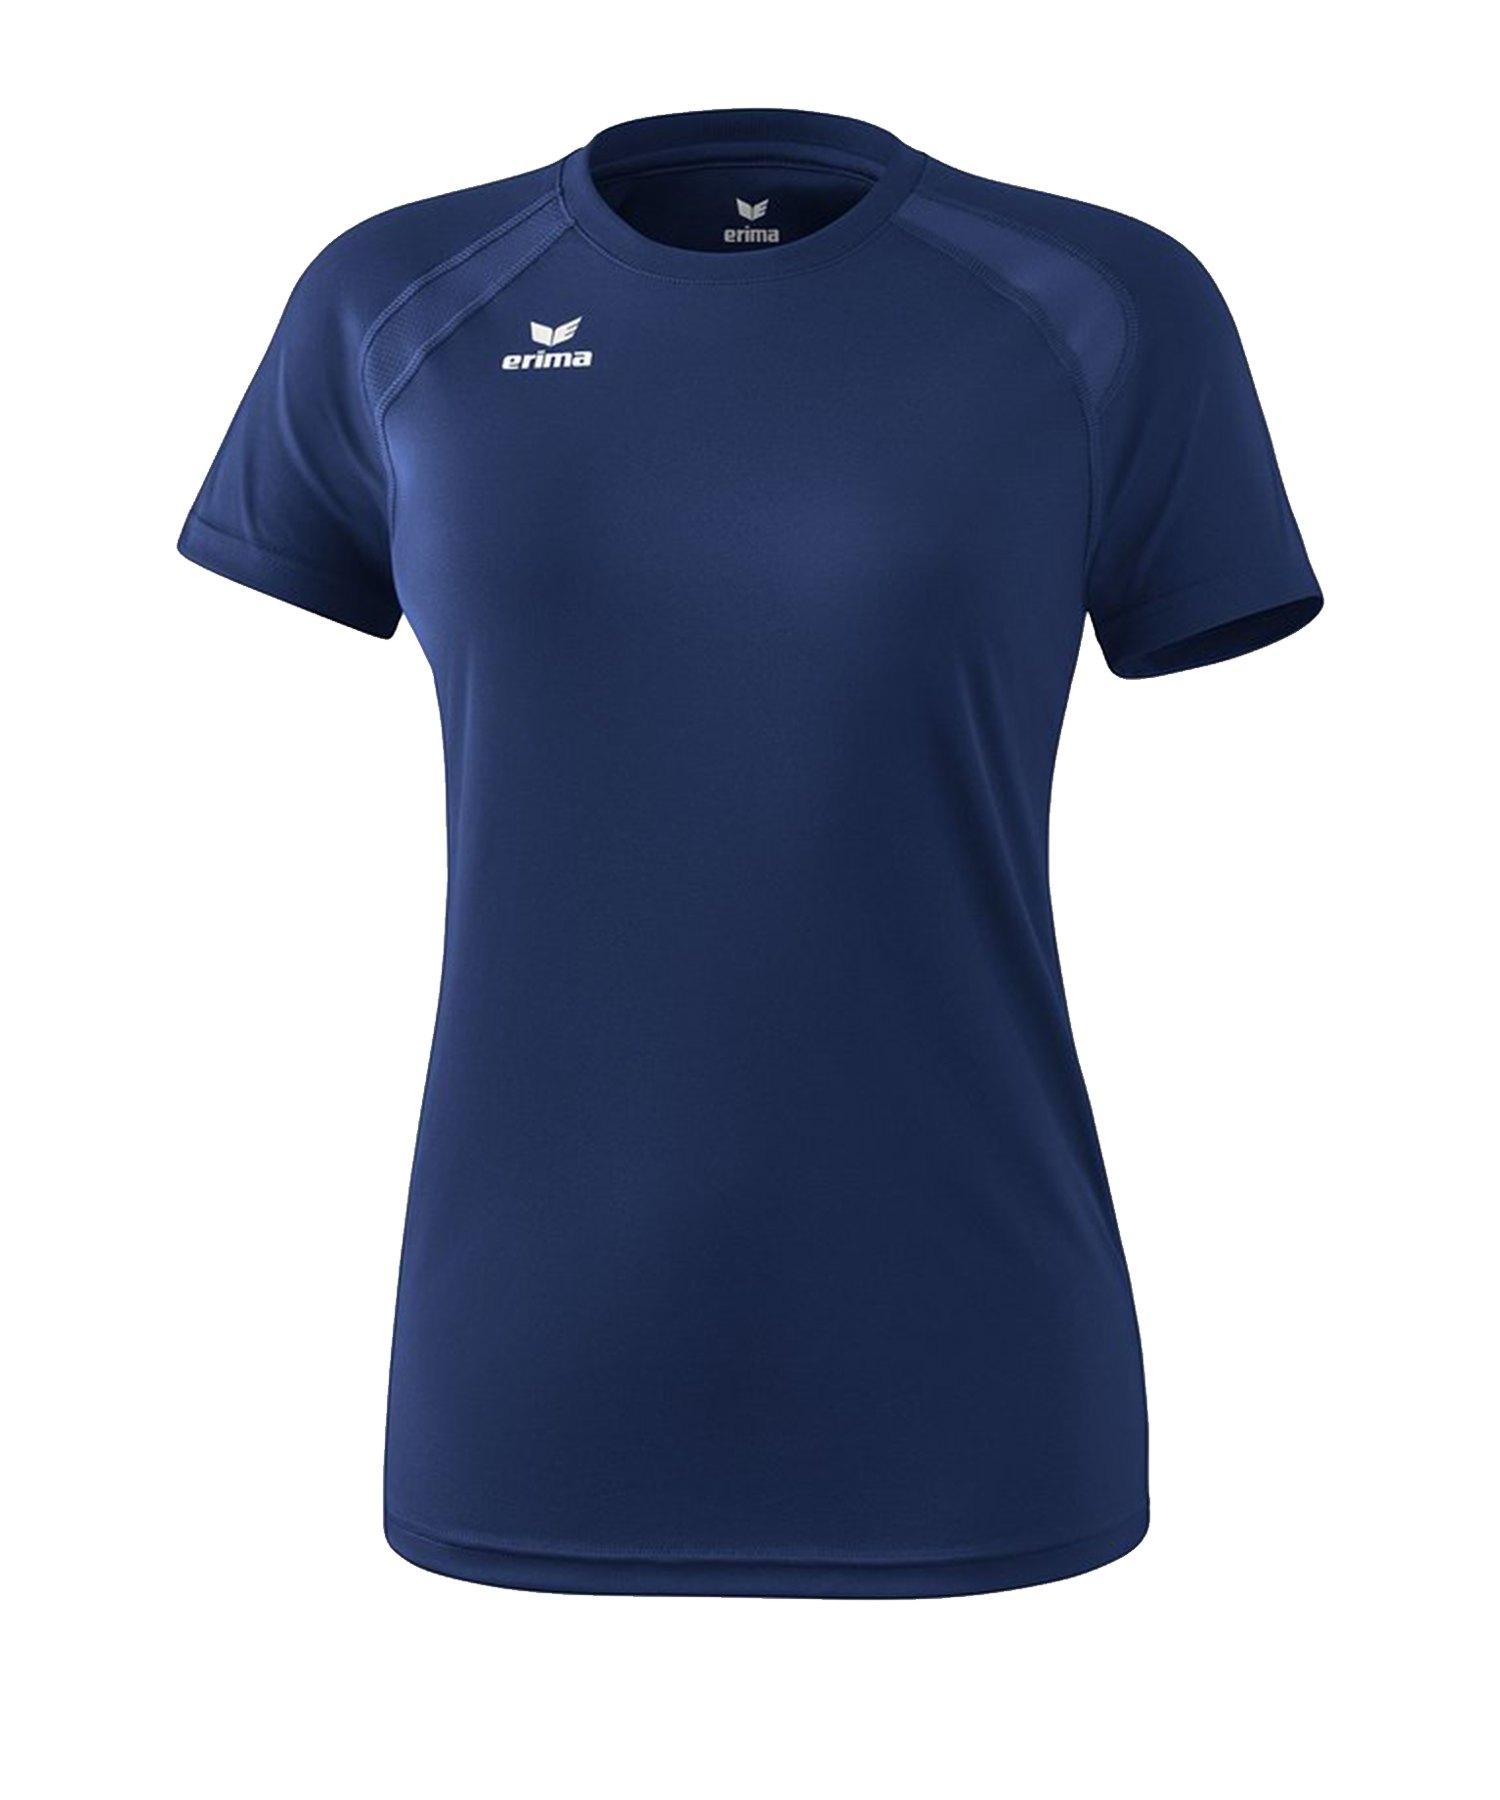 Erima Performance T-Shirt Damen Blau - Blau